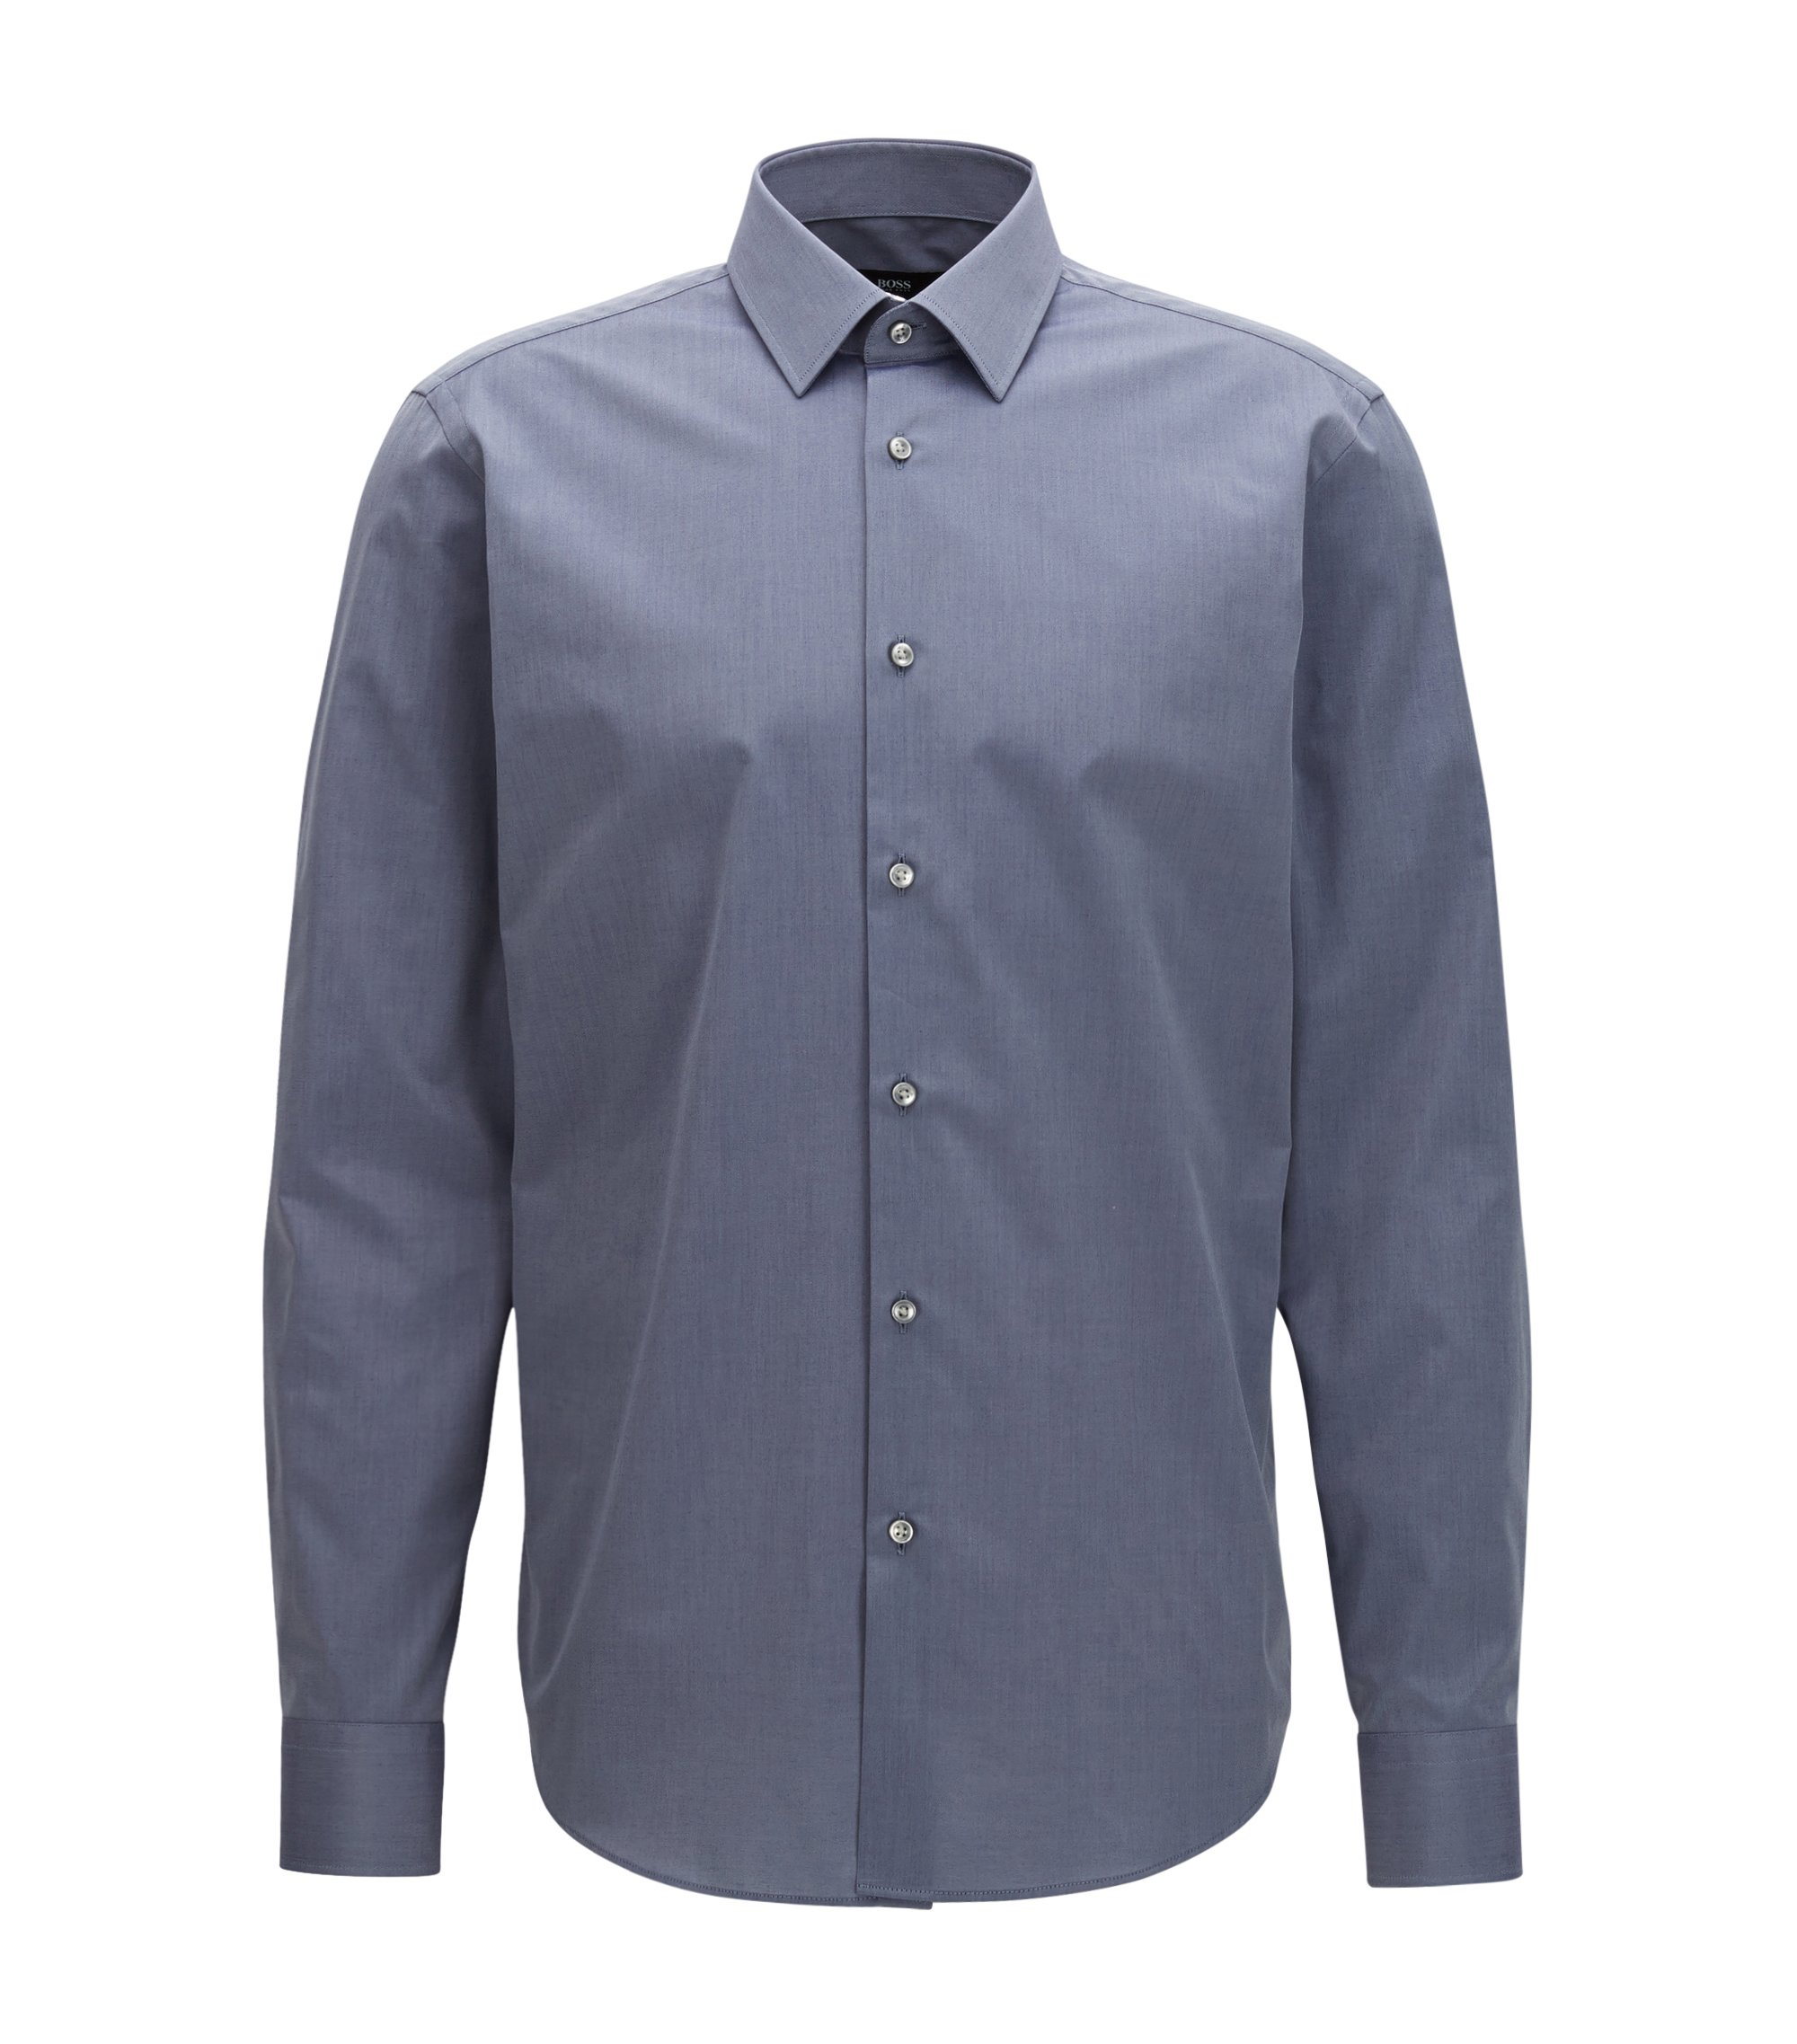 Chambray Cotton Dress Shirt, Regular Fit | Enzo, Dark Grey